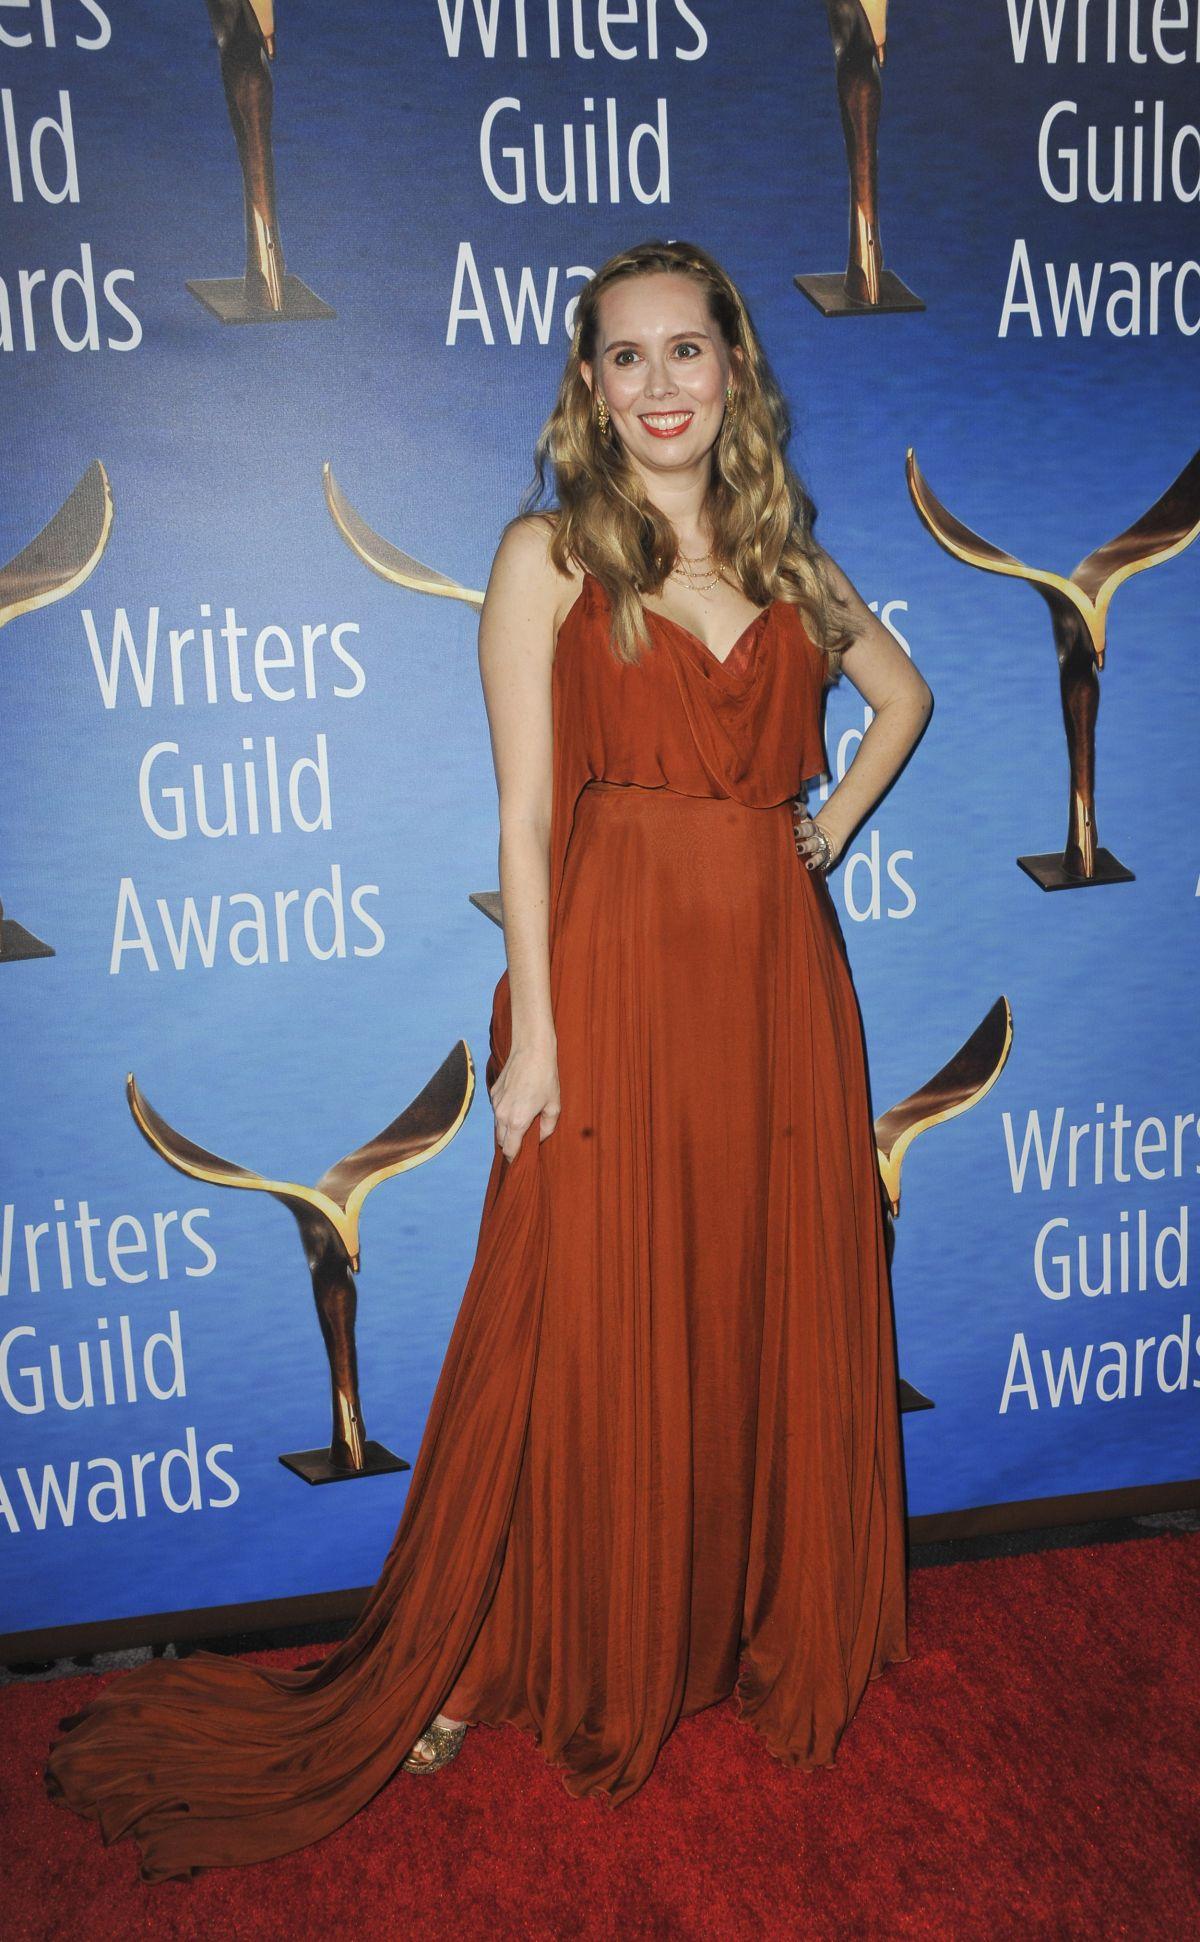 ALLISON SCHROEDER at 2017 Writers Guild Awards in Beverly Hills 02/19/2017